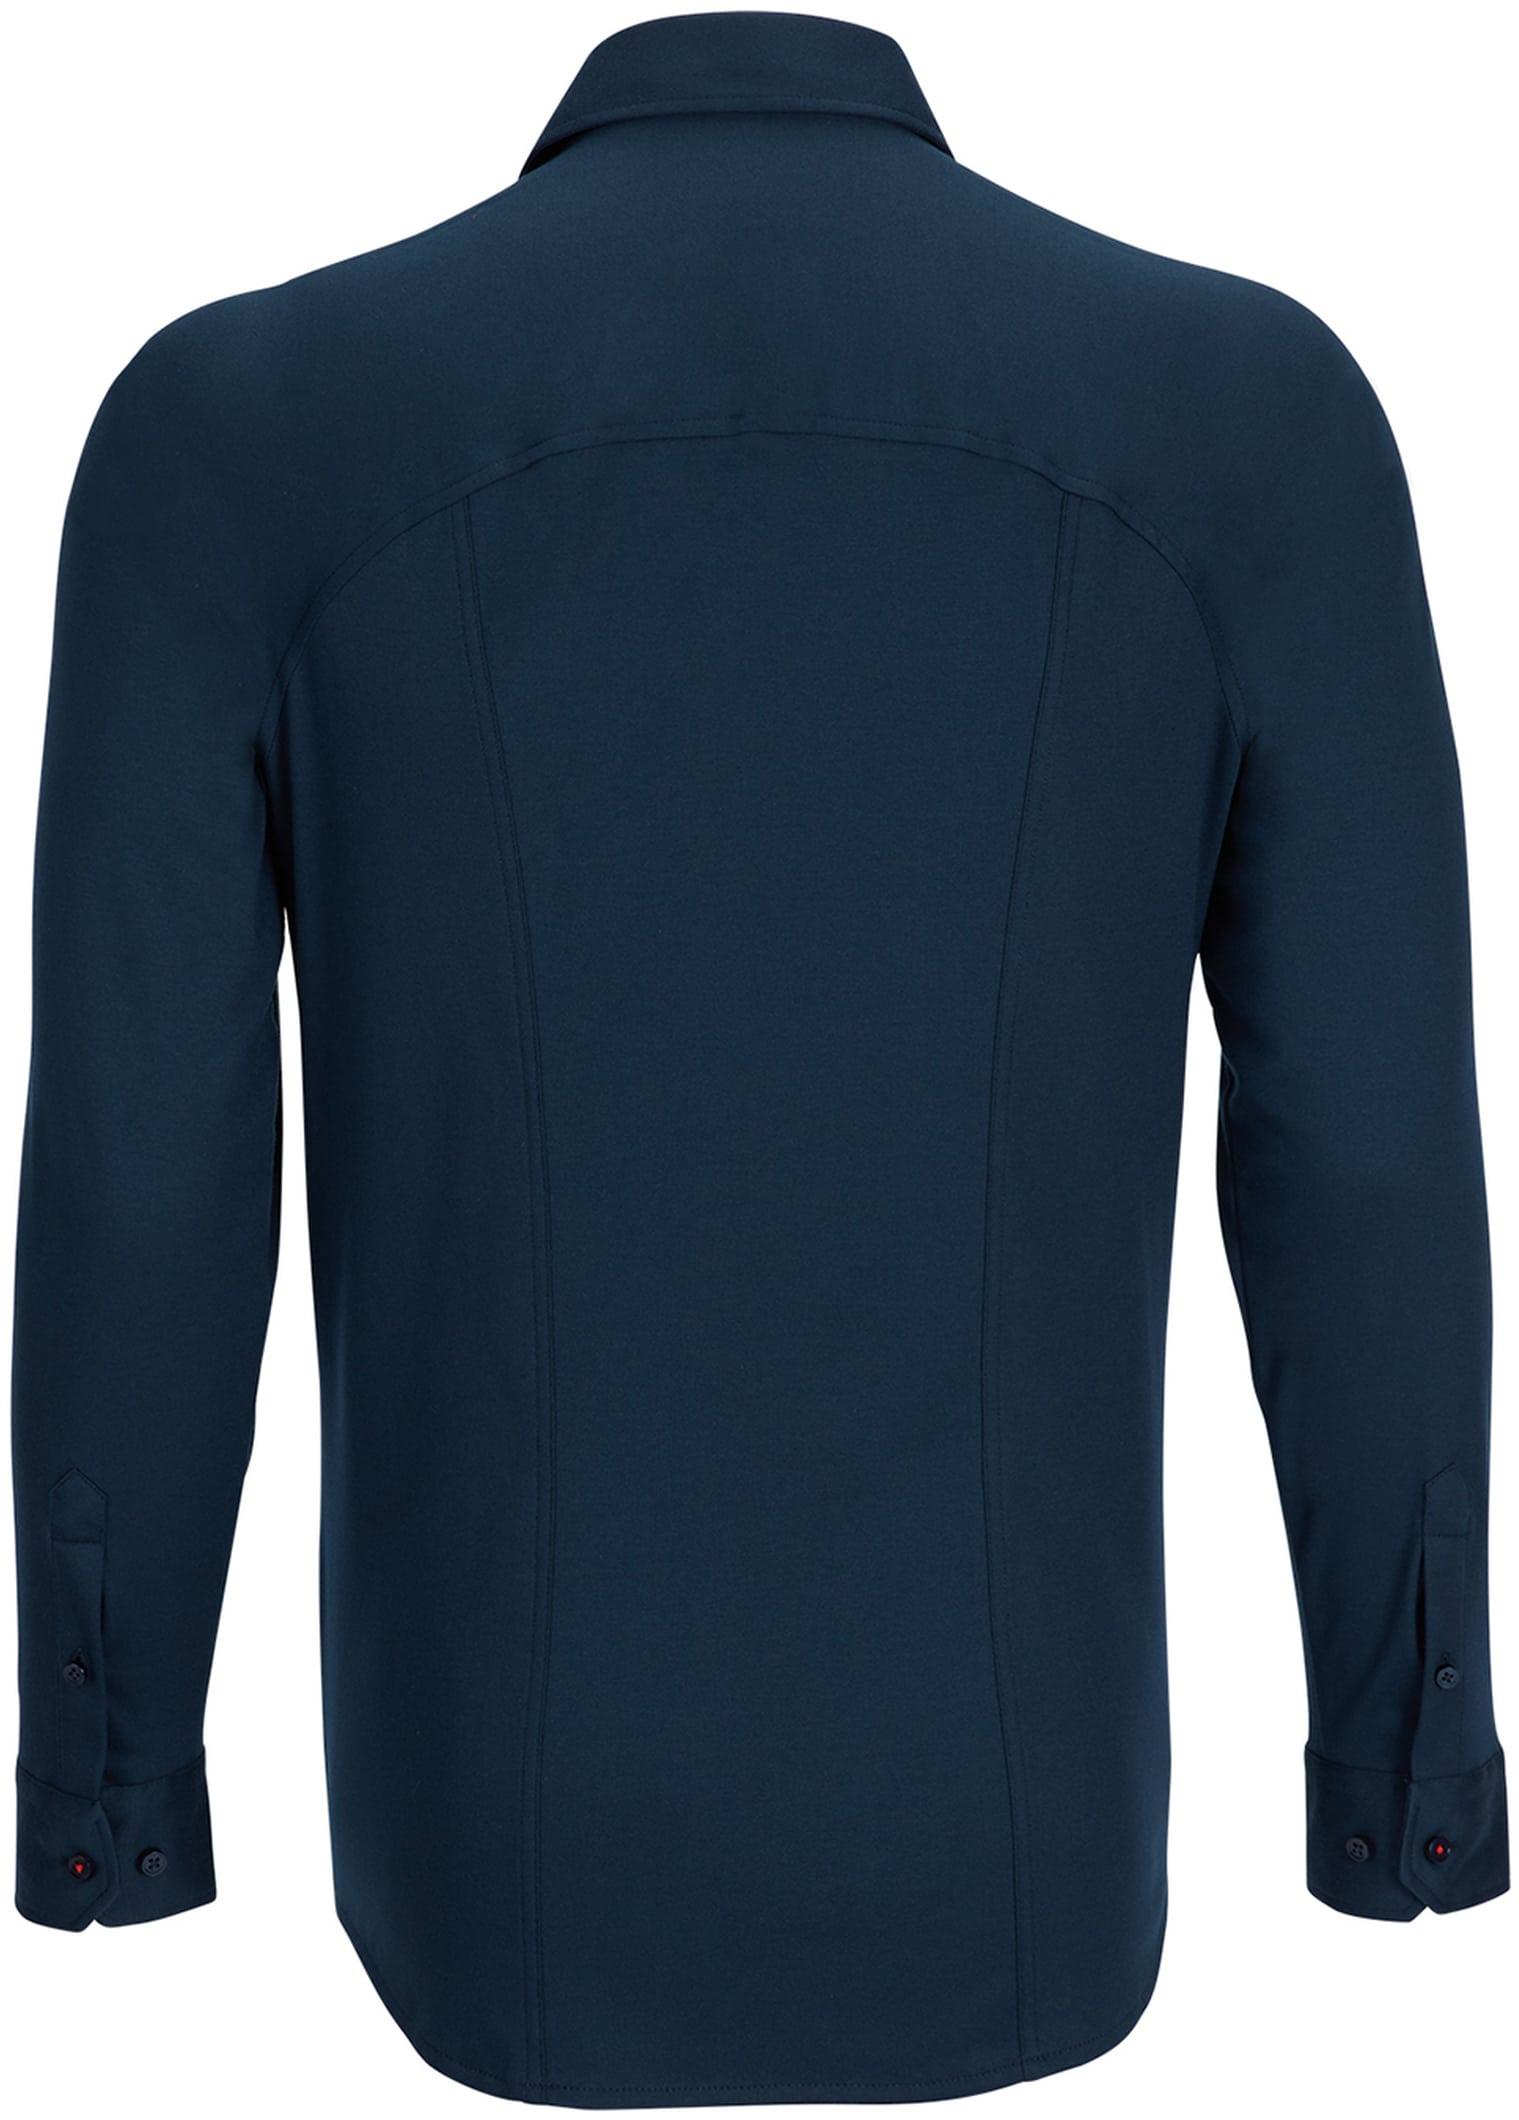 Desoto Shirt Non Iron Navy foto 1